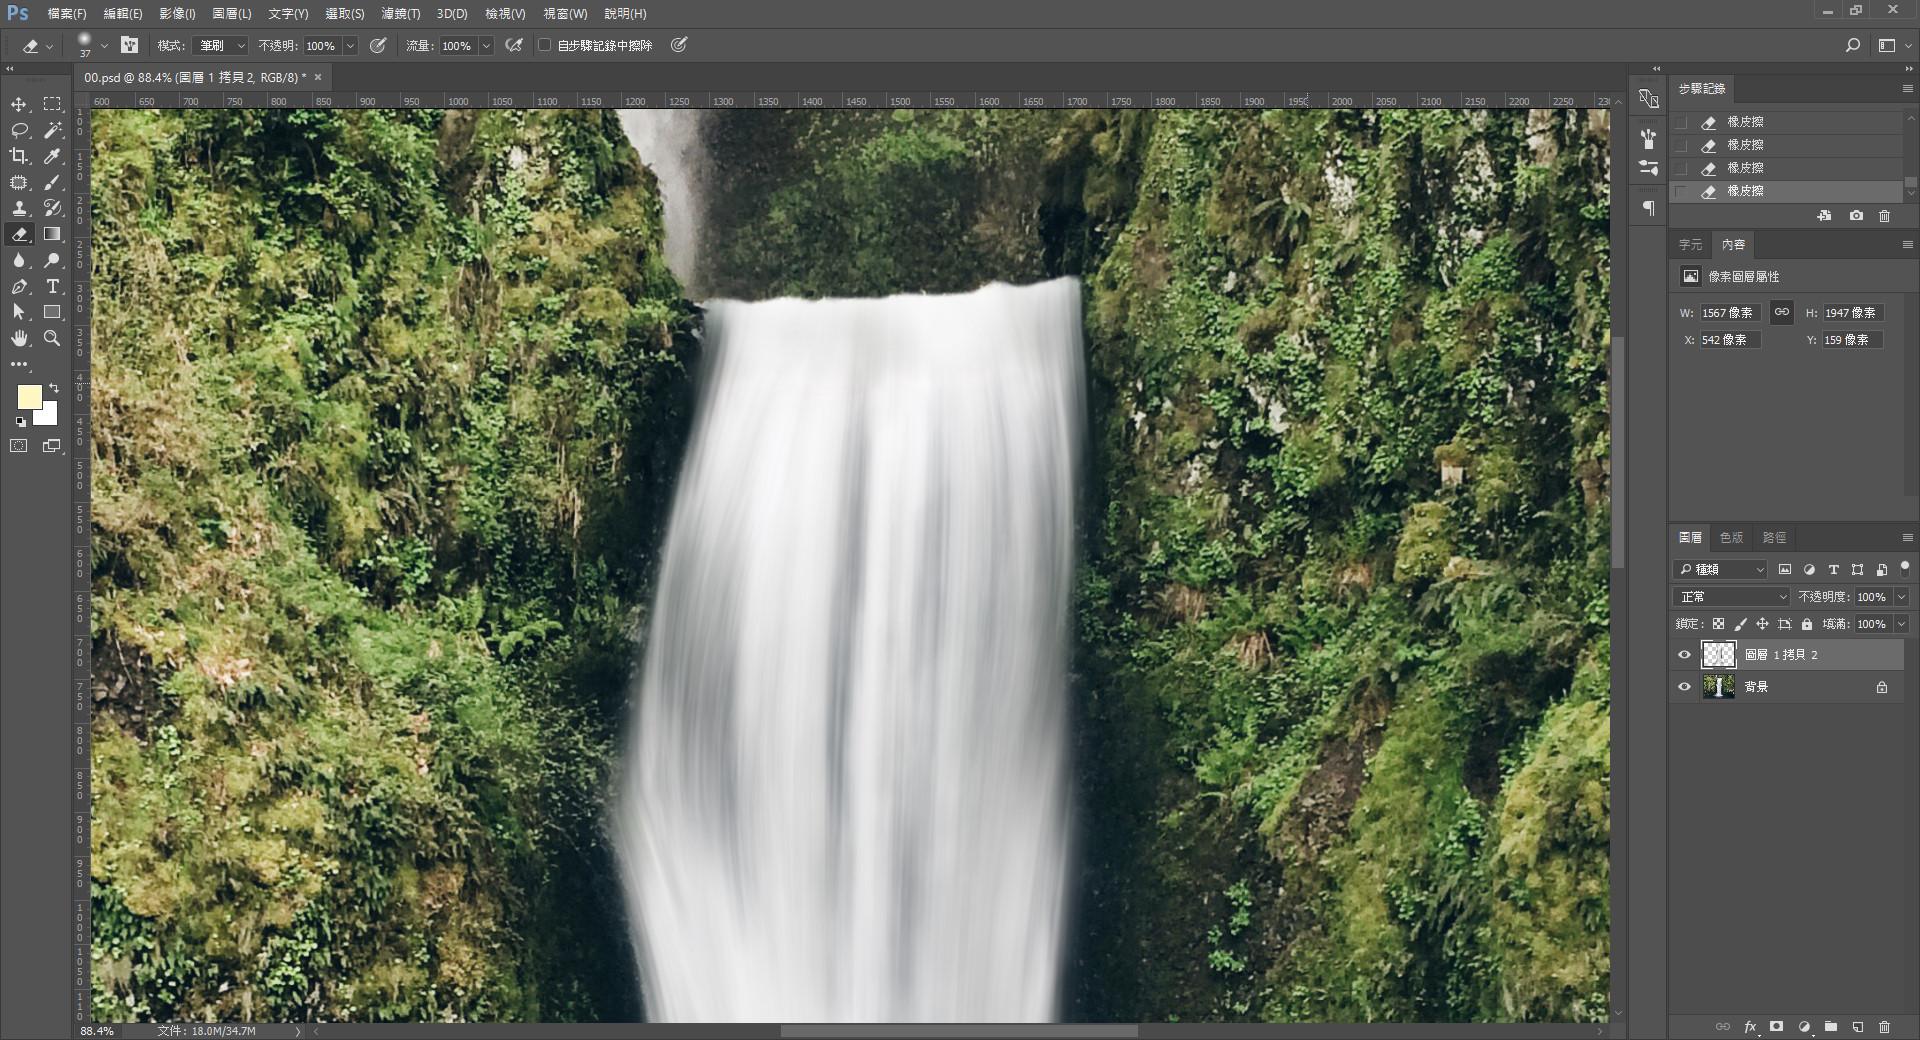 Photoshop - Path Blur Tool (14)